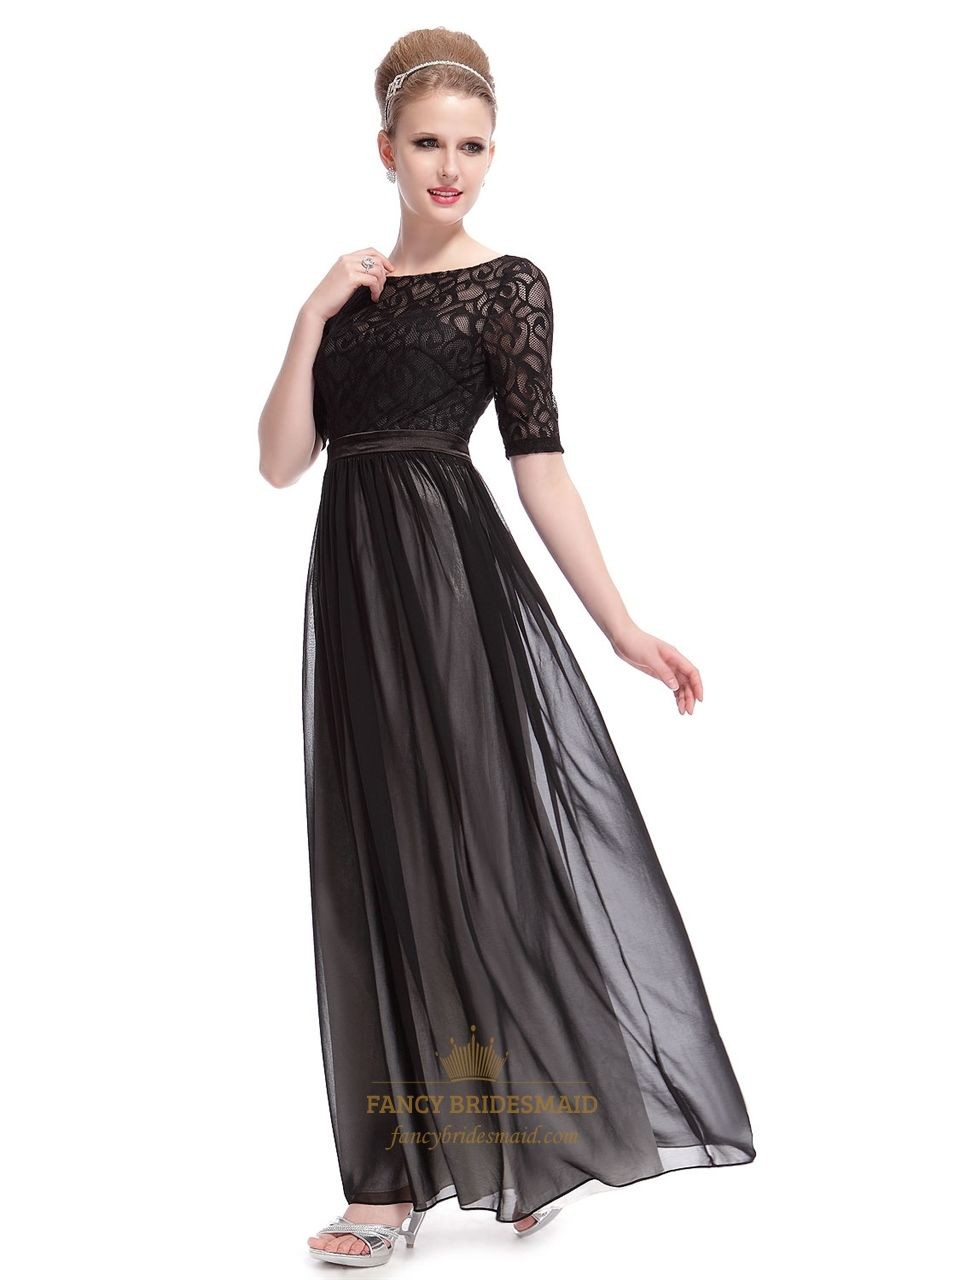 Elegant Black Dresses With Lace Long Sleeves Overlay Long Black Maxi Dress With Sleeves Maxi Dress Wedding Long Black Maxi Dress Black Lace Bridesmaid Dress [ 1280 x 960 Pixel ]